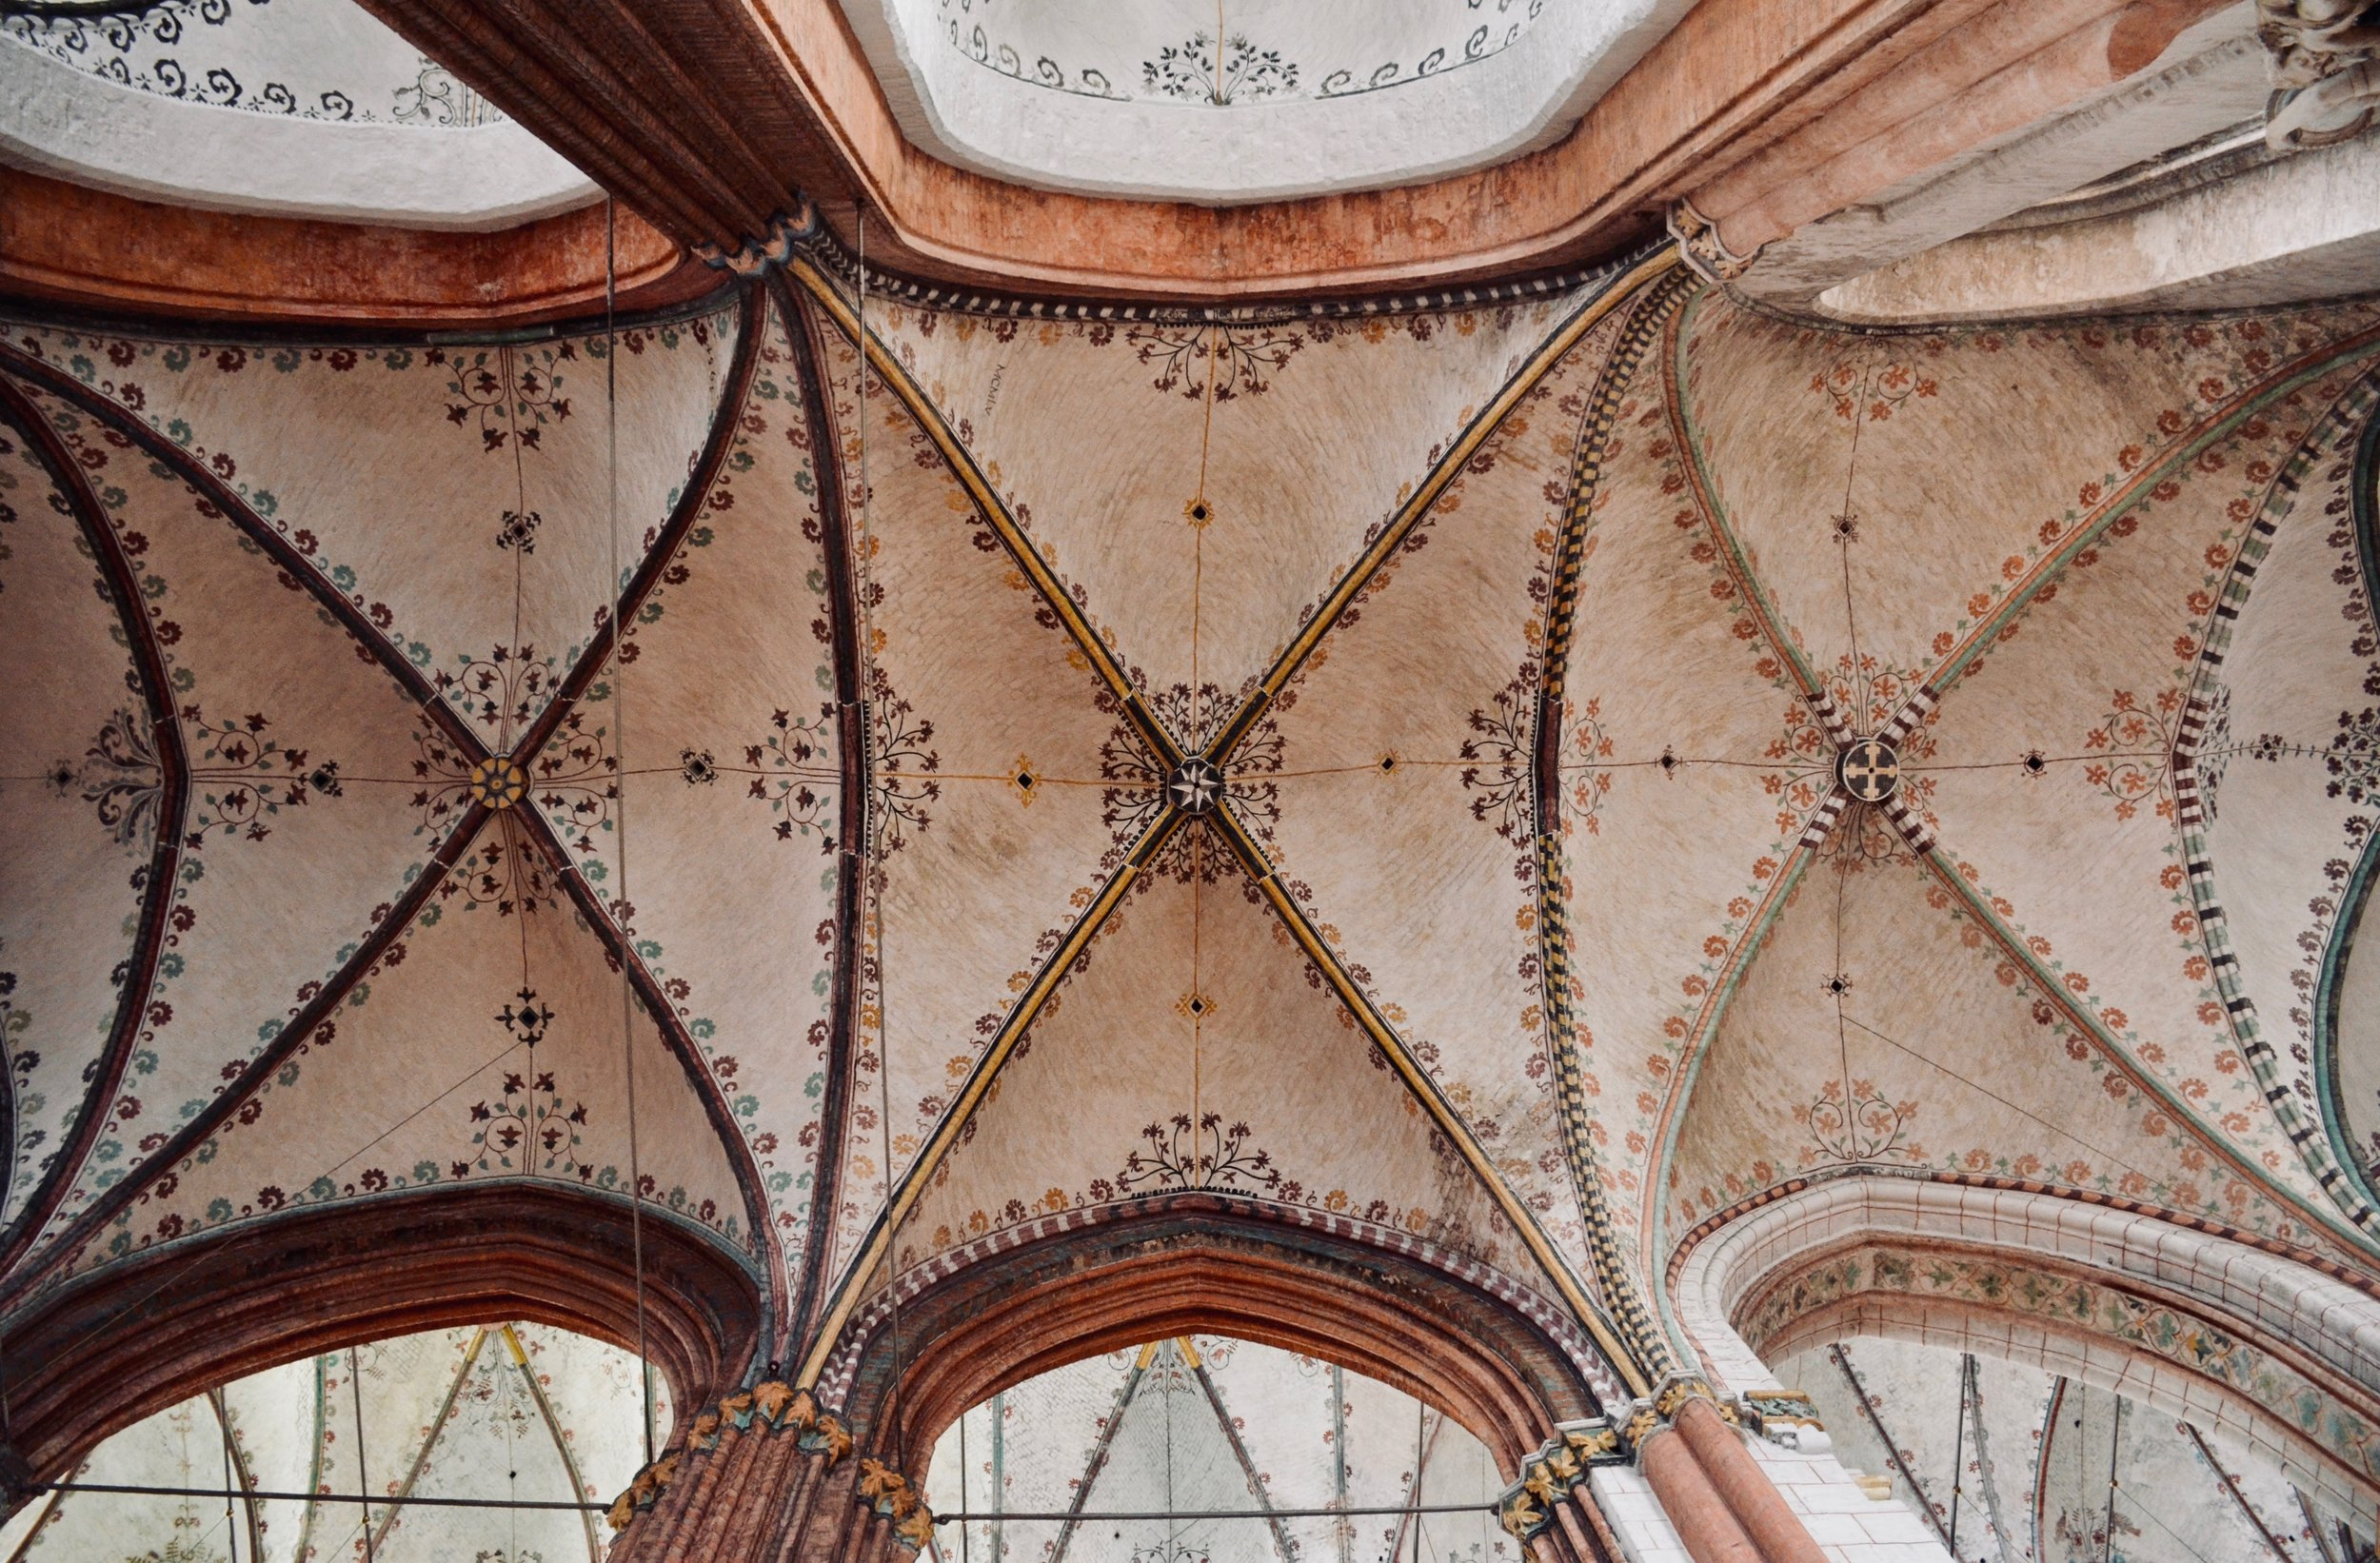 Ceiling detail, Marienkirche, Lübeck.